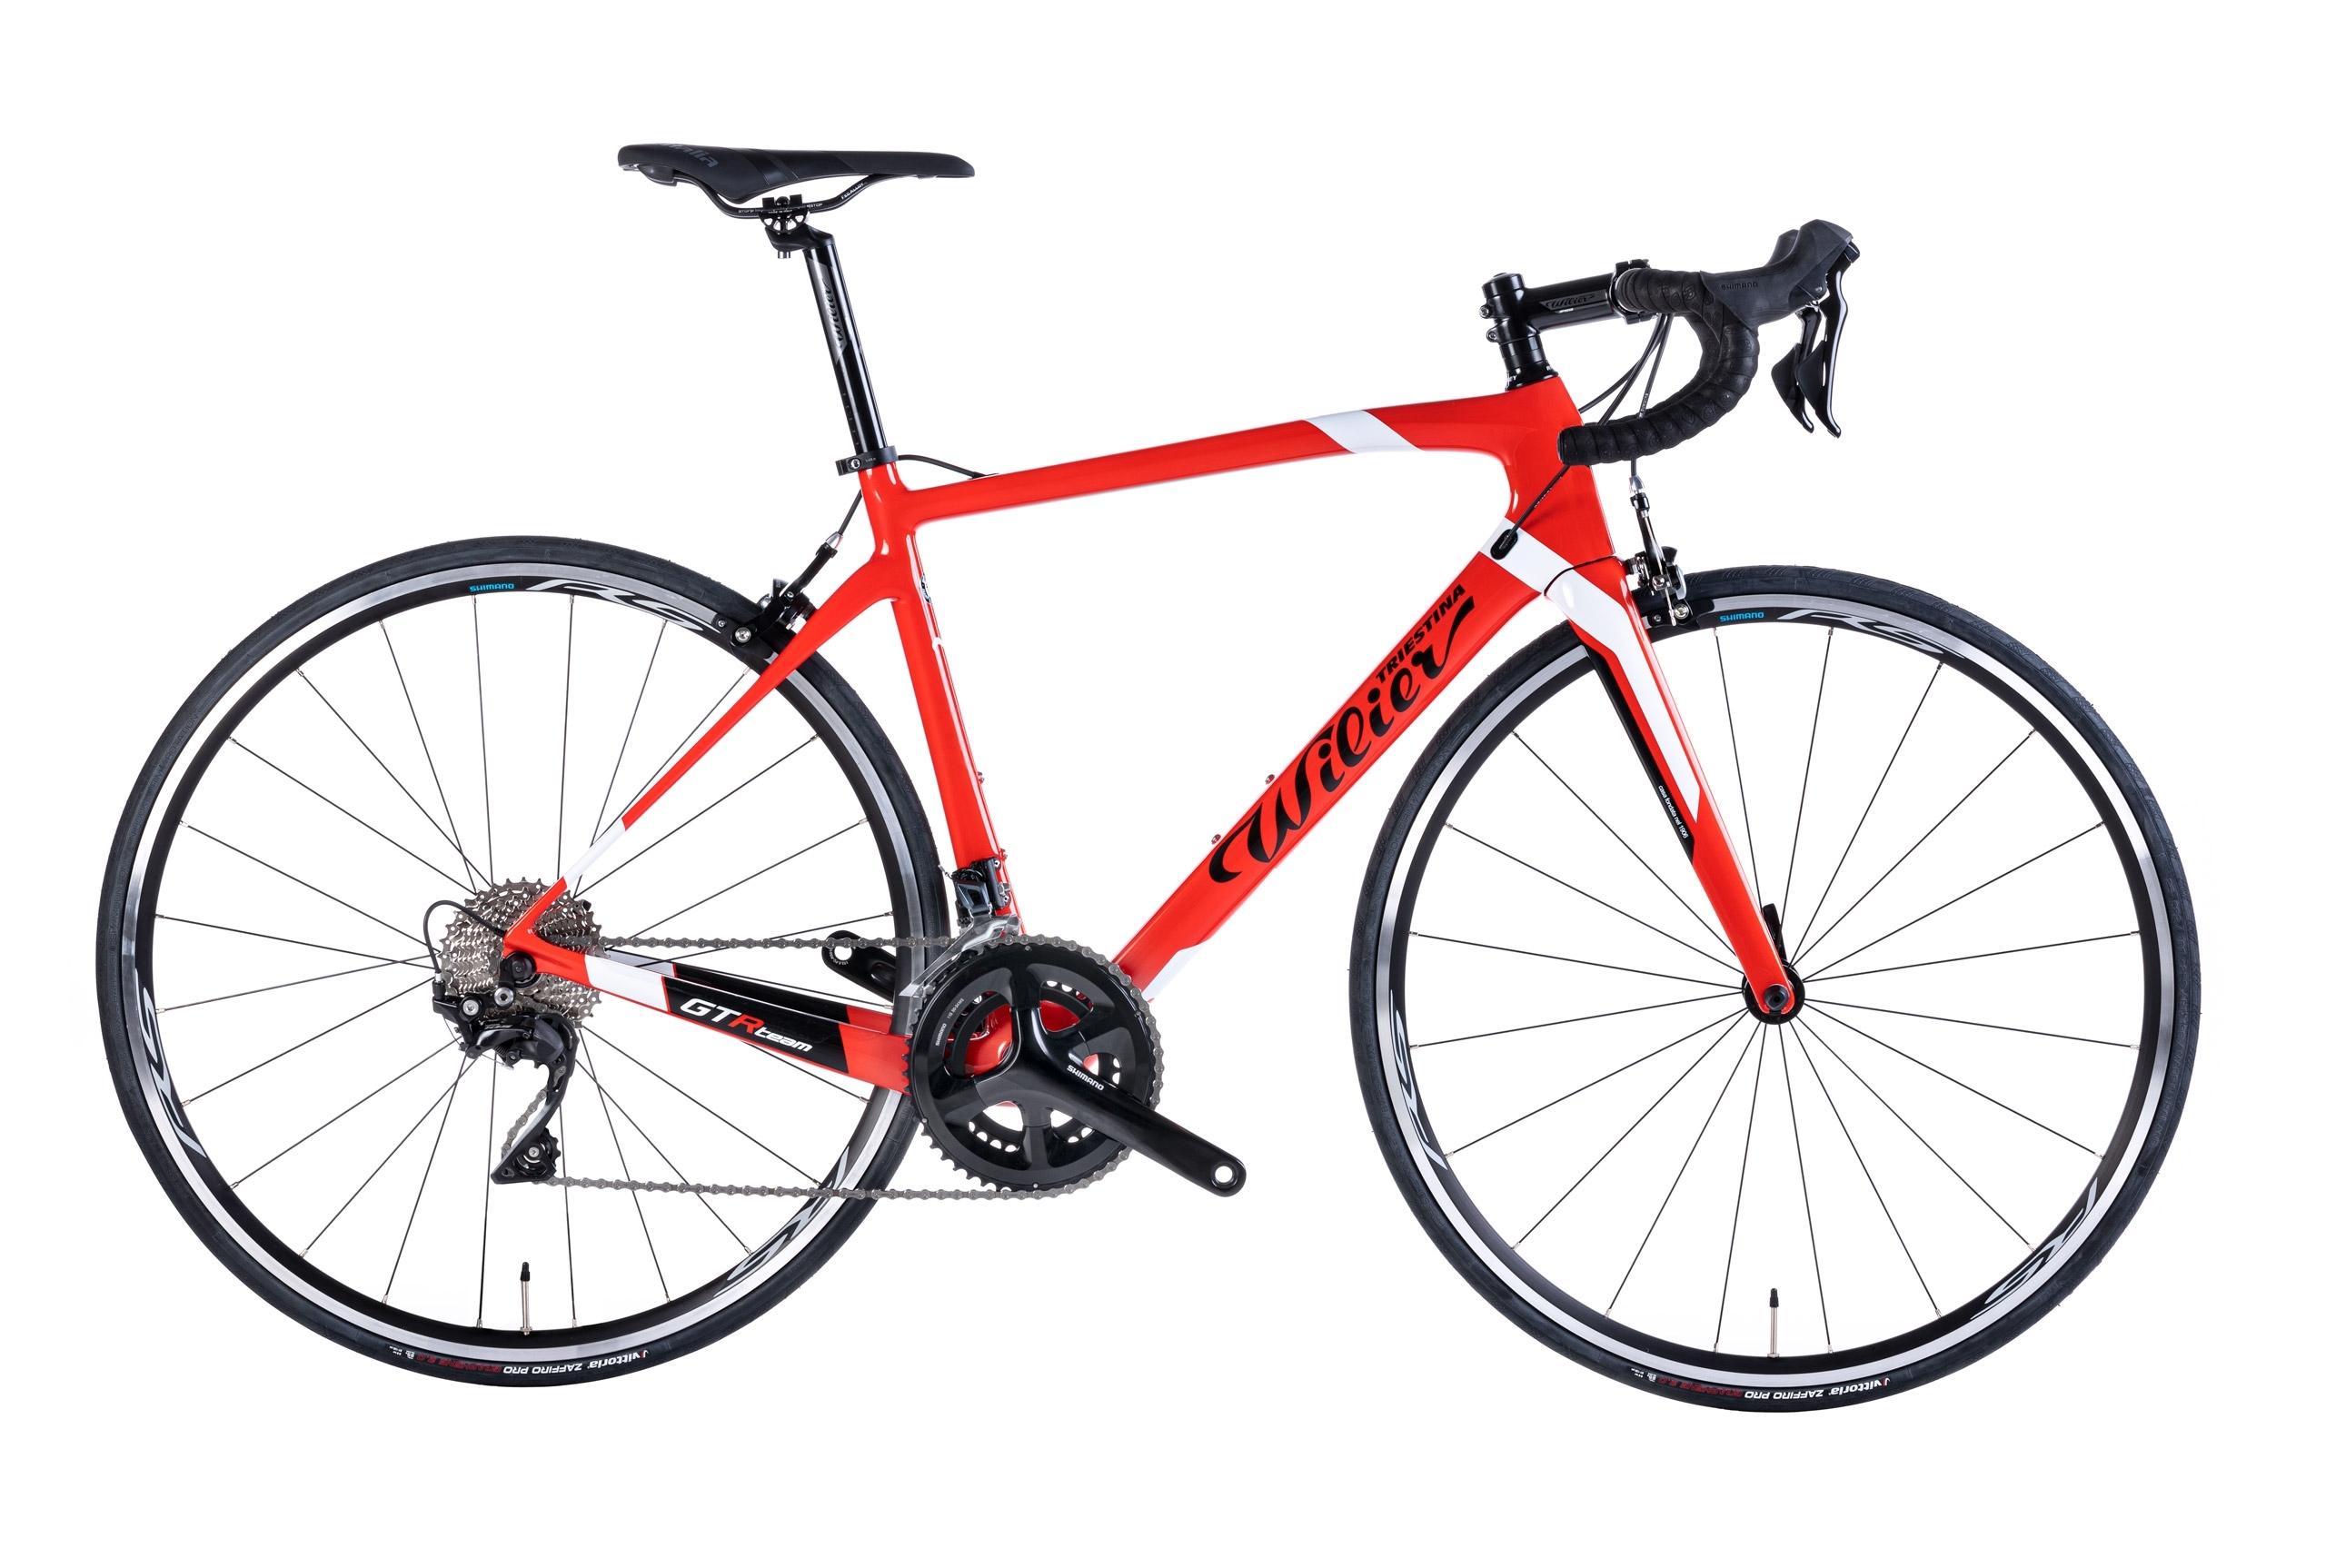 kolo GTR TEAM 2021 Rim+SH105 2.0+RS100 red white L